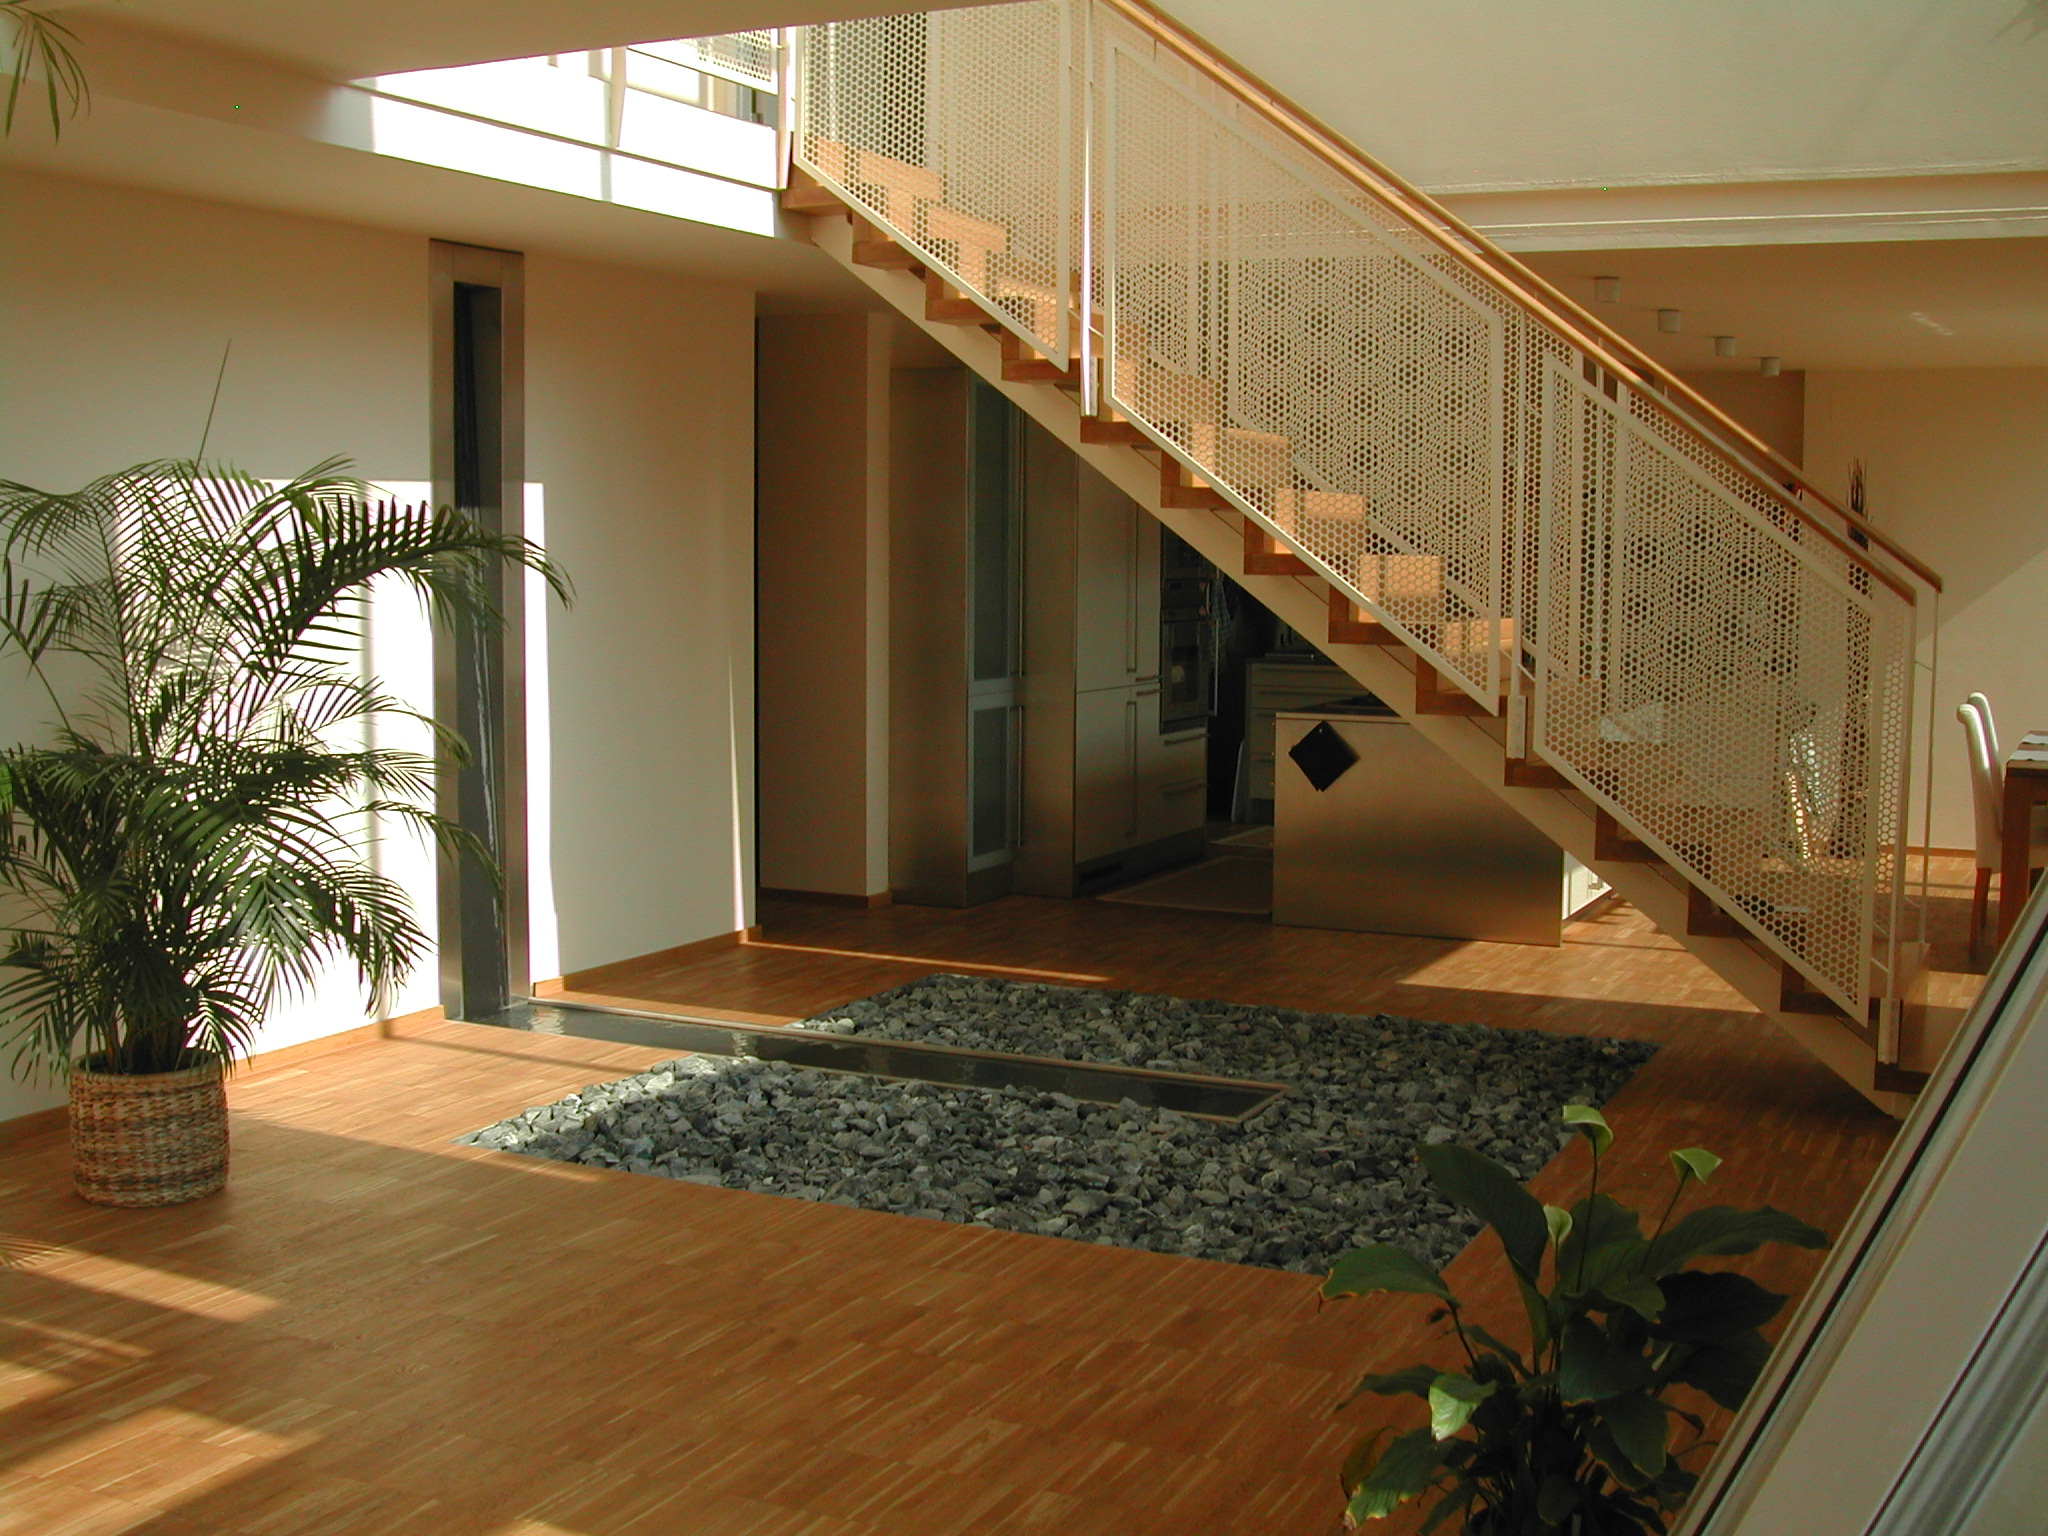 liegler takeh architekten projekt whs59 33 liegler takeh architekten. Black Bedroom Furniture Sets. Home Design Ideas